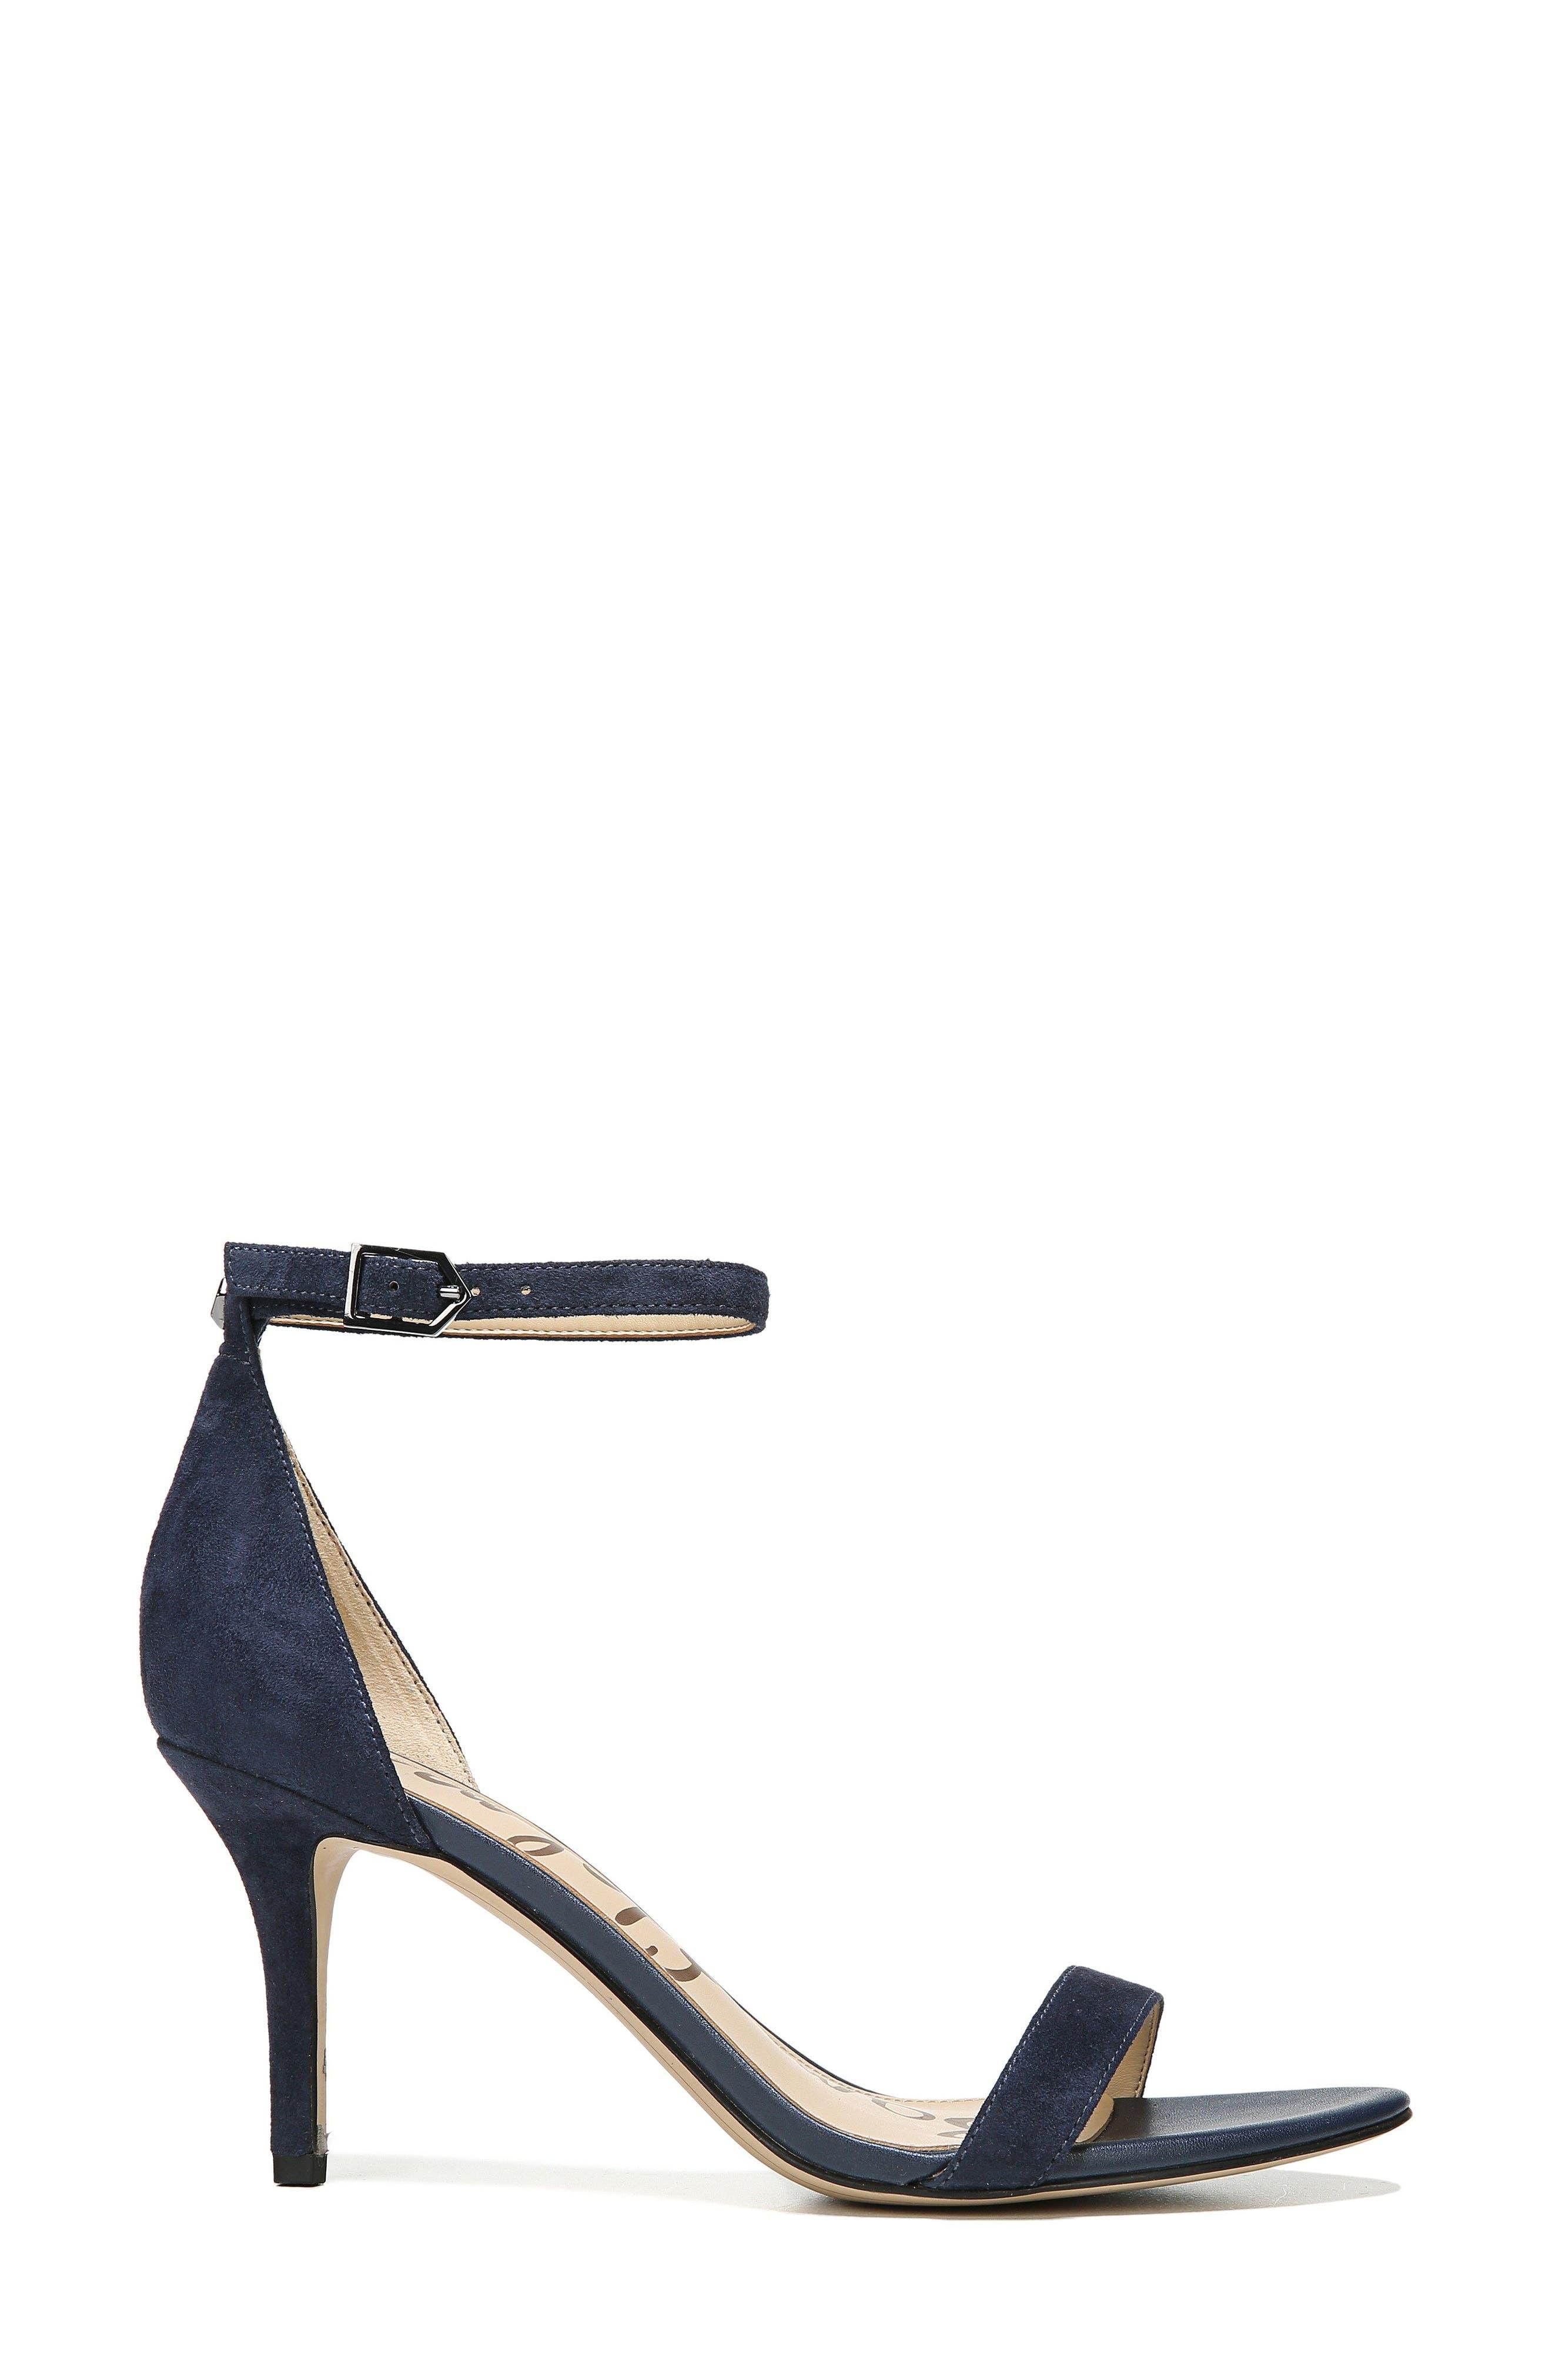 ,                             'Patti' Ankle Strap Sandal,                             Alternate thumbnail 200, color,                             407